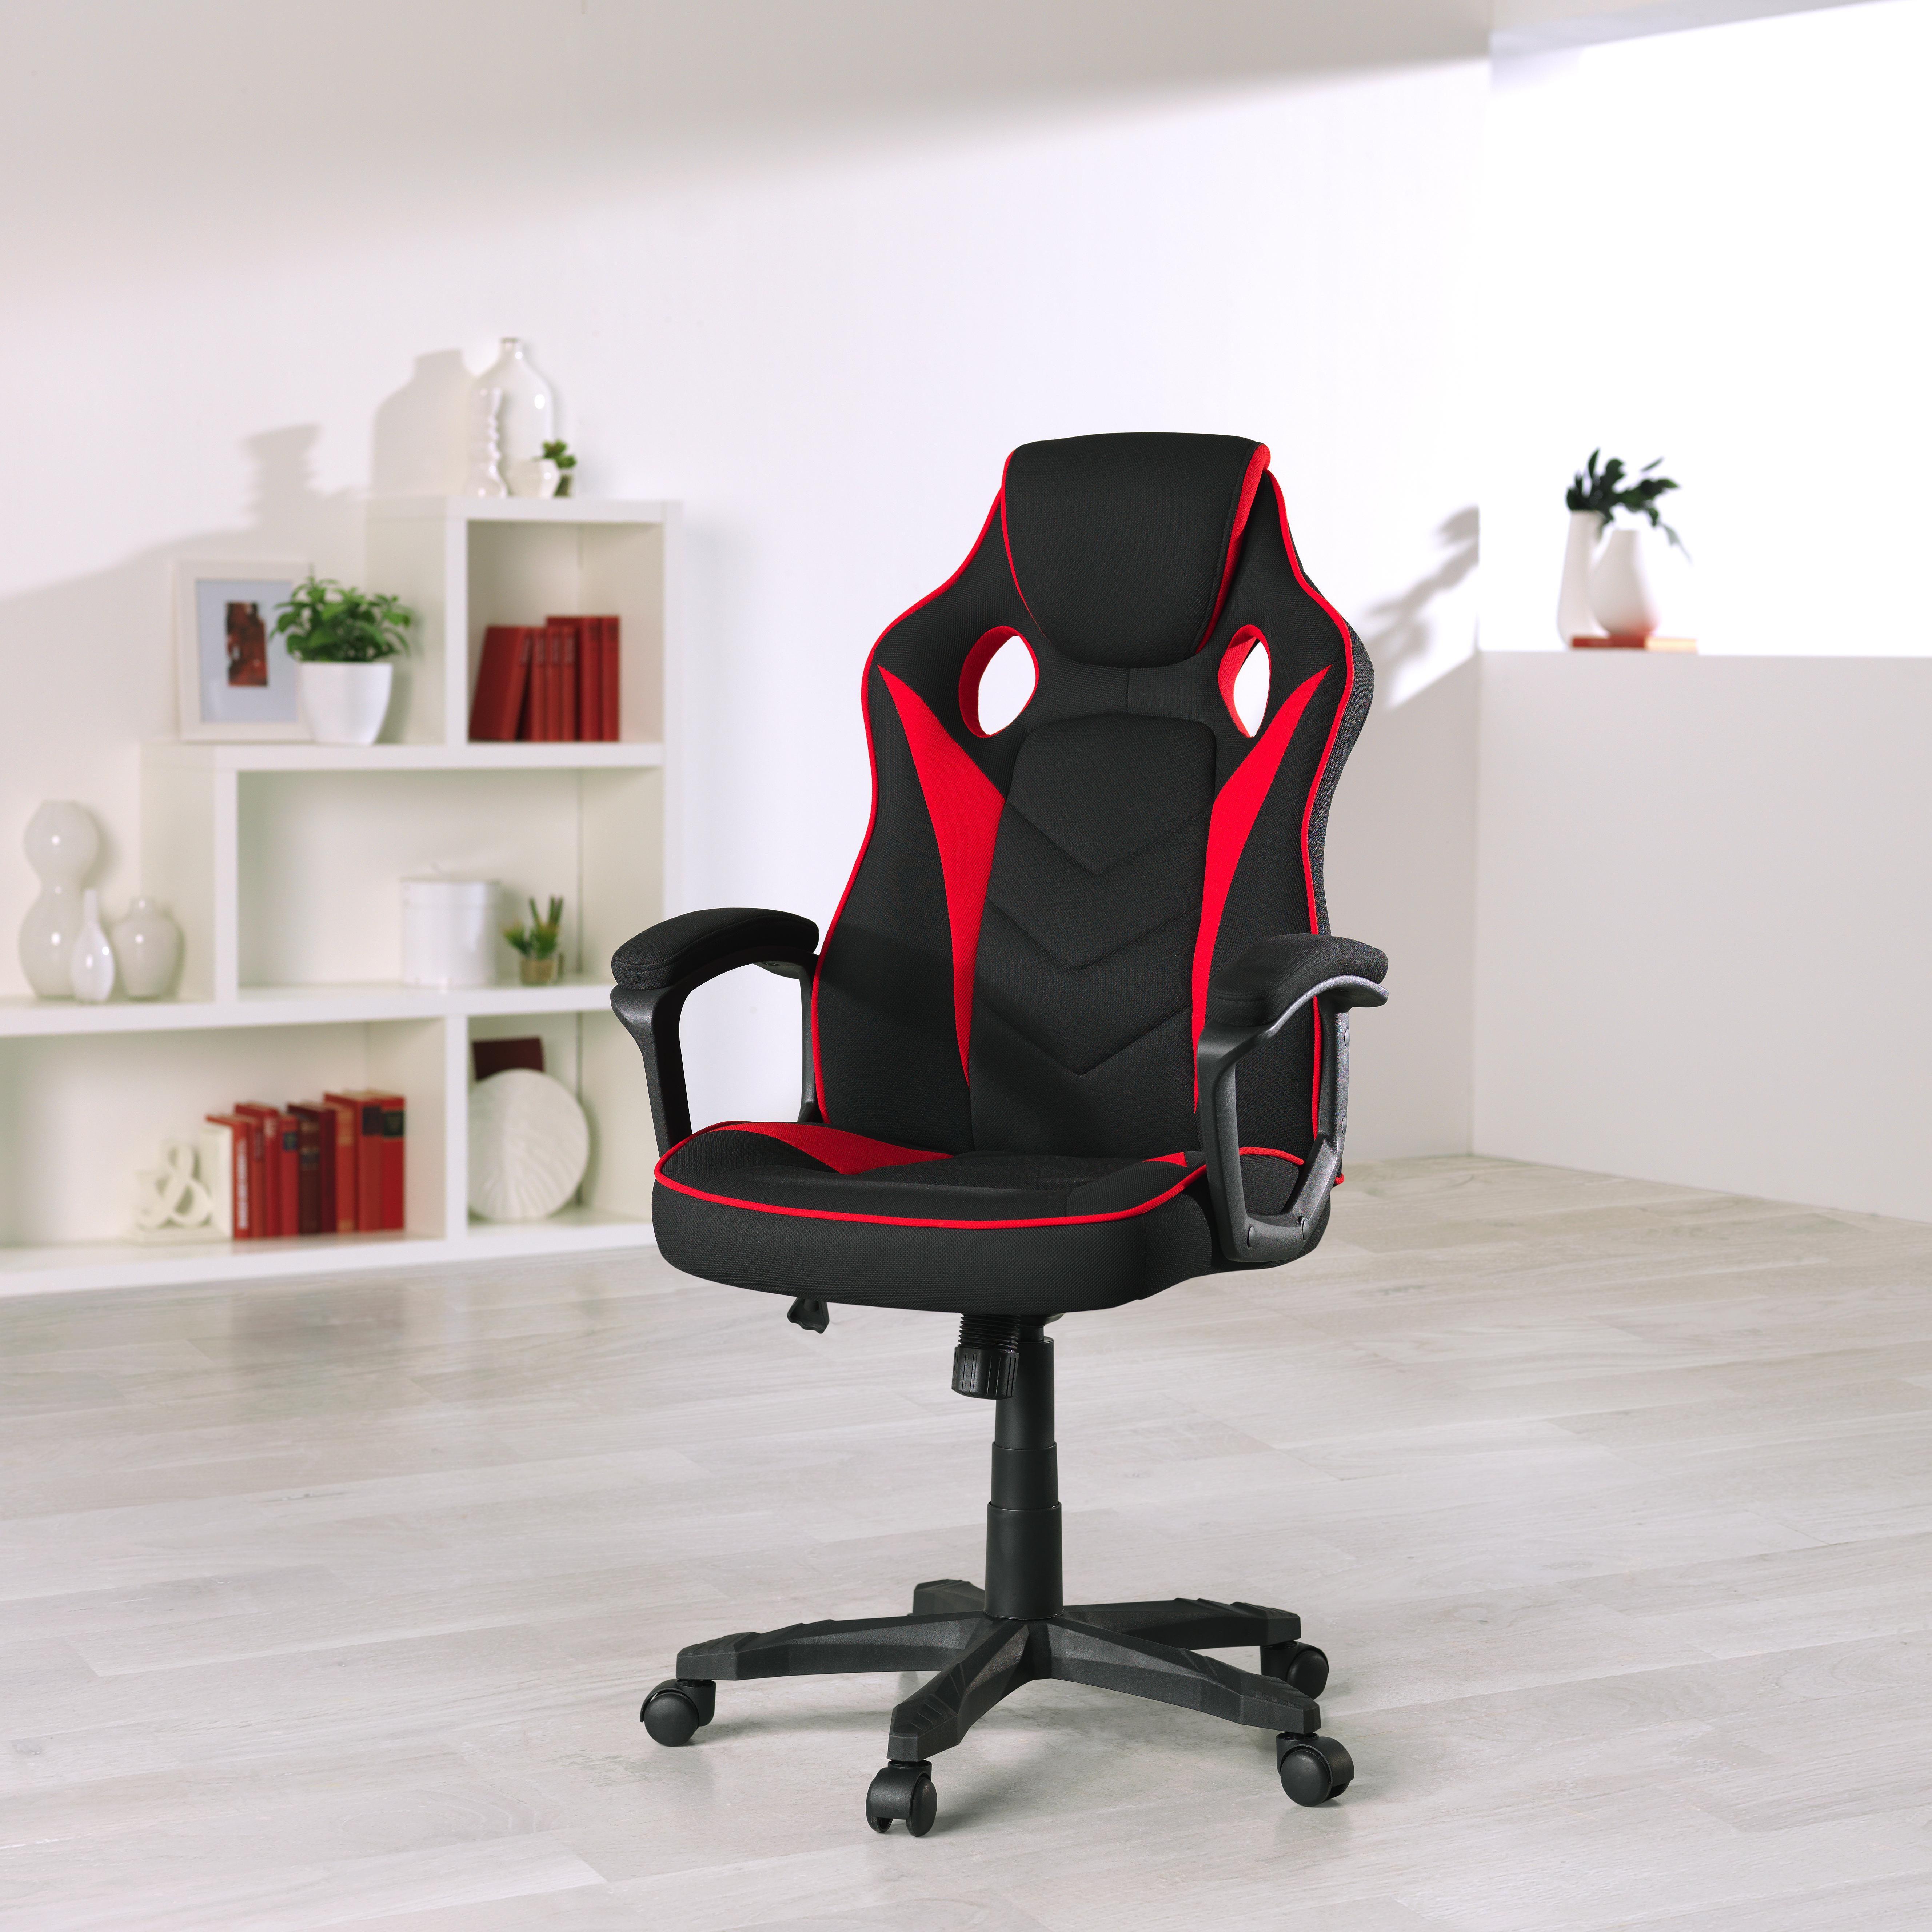 GAMINGSTOL - röd/svart, Design, metall/textil (65,5/110(120)/69cm) - Xora